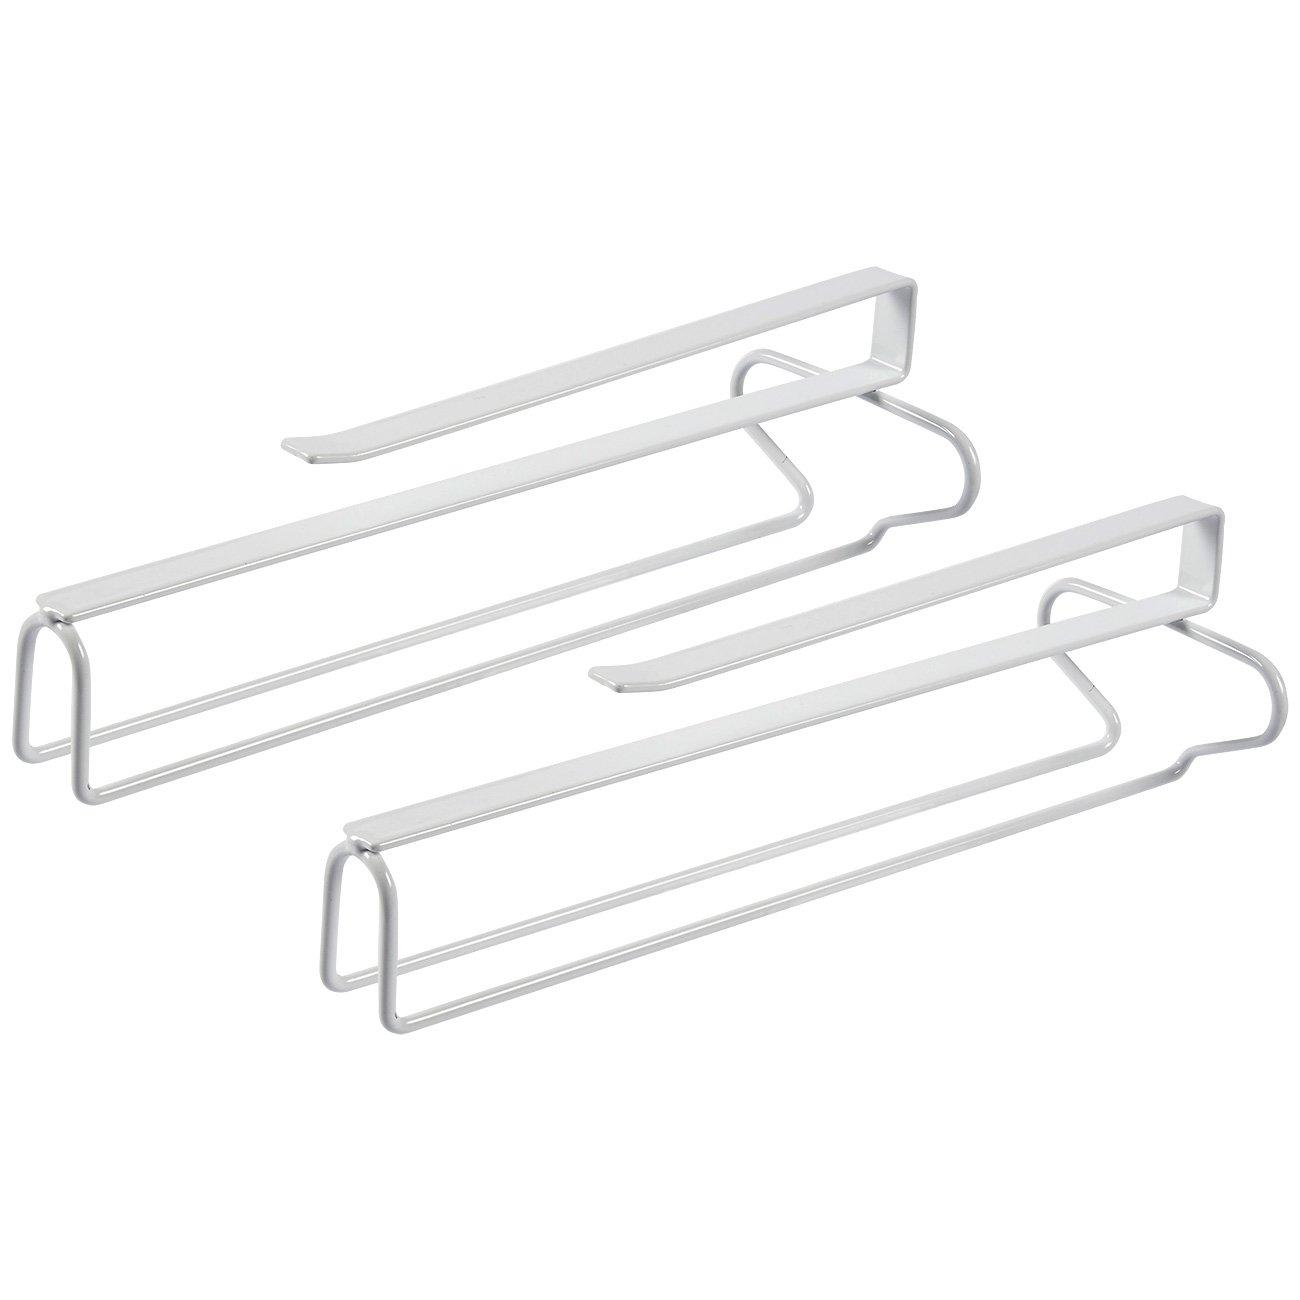 Glass Holder - 2-Pack Wine Glass Rack, Under-Cabinet Stemware Rack Organizer, Hanging Wine Glasses Storage, White Iron Wire, 12.1 x 4 x 3.1 Inches